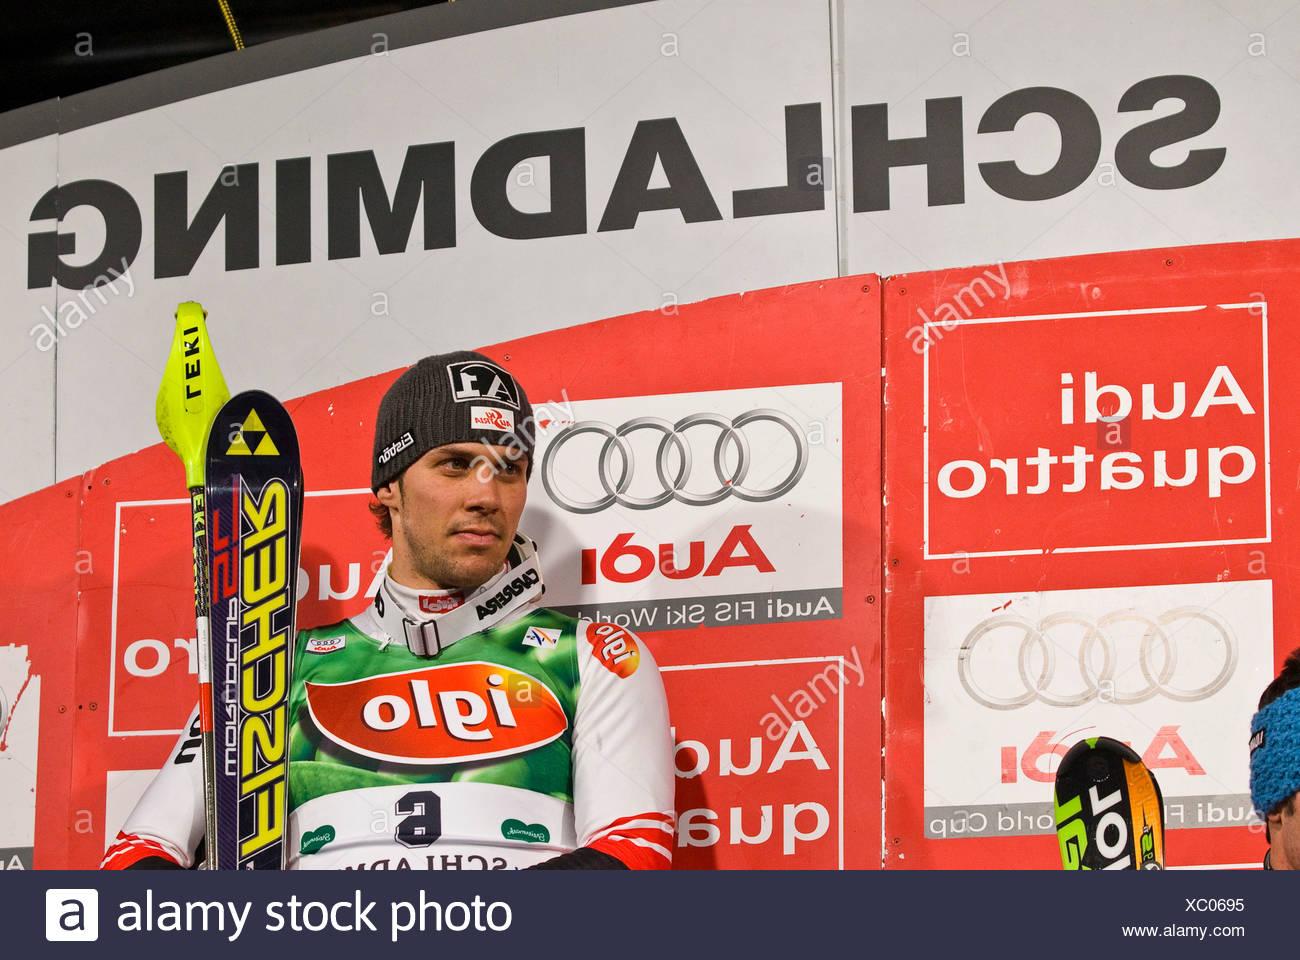 Flower ceremonie, Mario Matt, FIS Ski Worldcup, Slalom men, Schladming, 2008, Nightrace, Styria, Austria - Stock Image